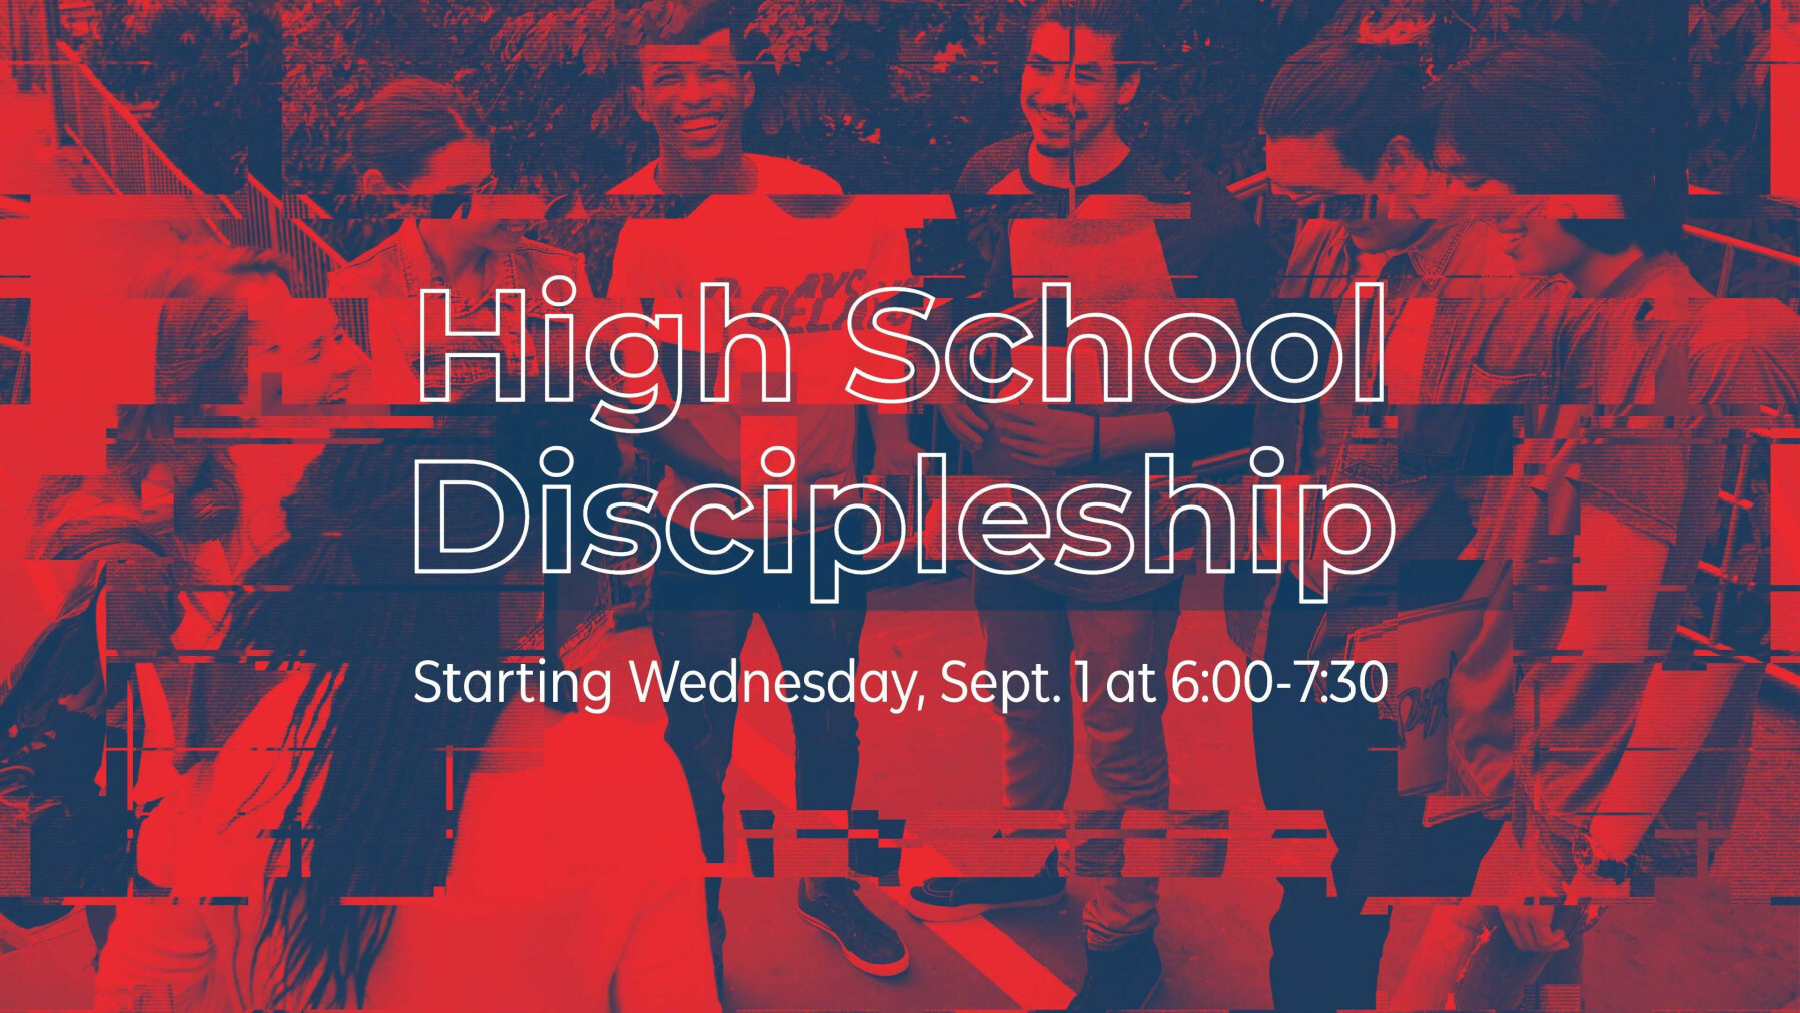 High School Discipleship